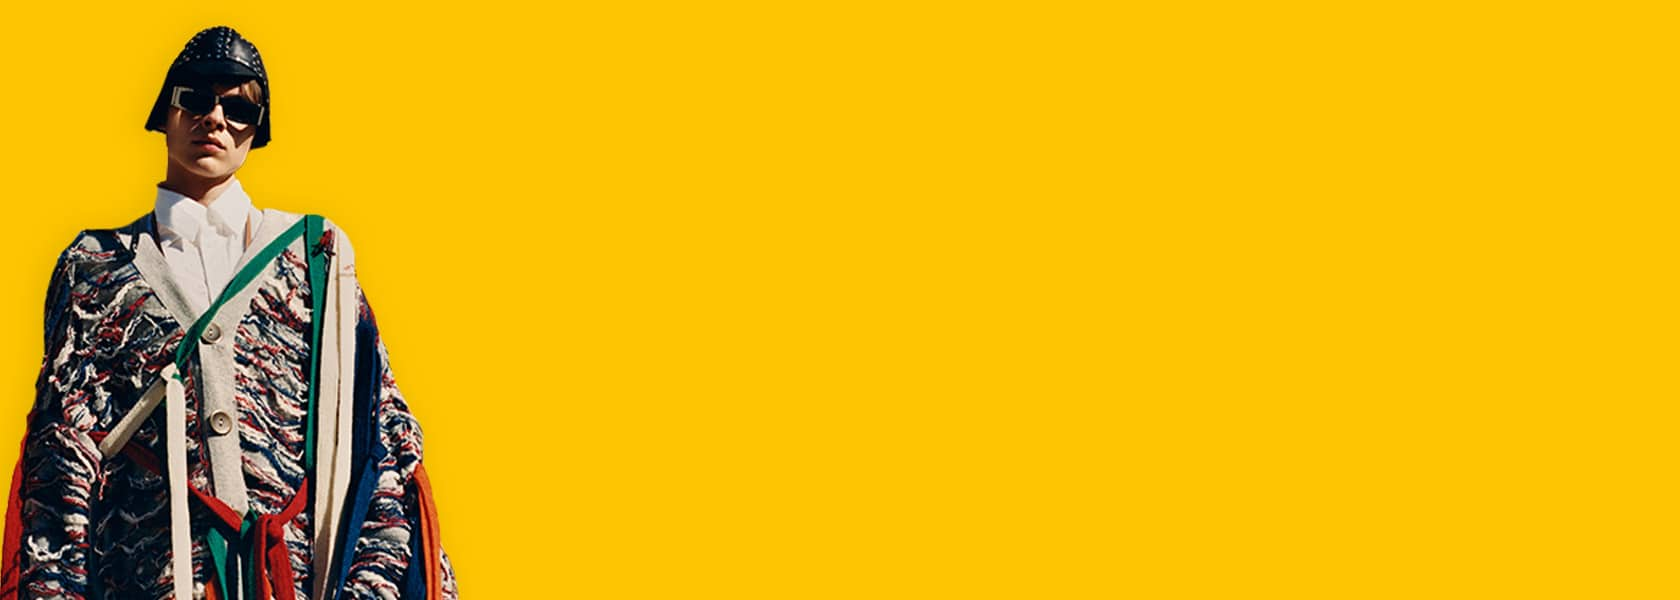 tendances-campagnes-de-hiver-volume-2-bandeau-slider